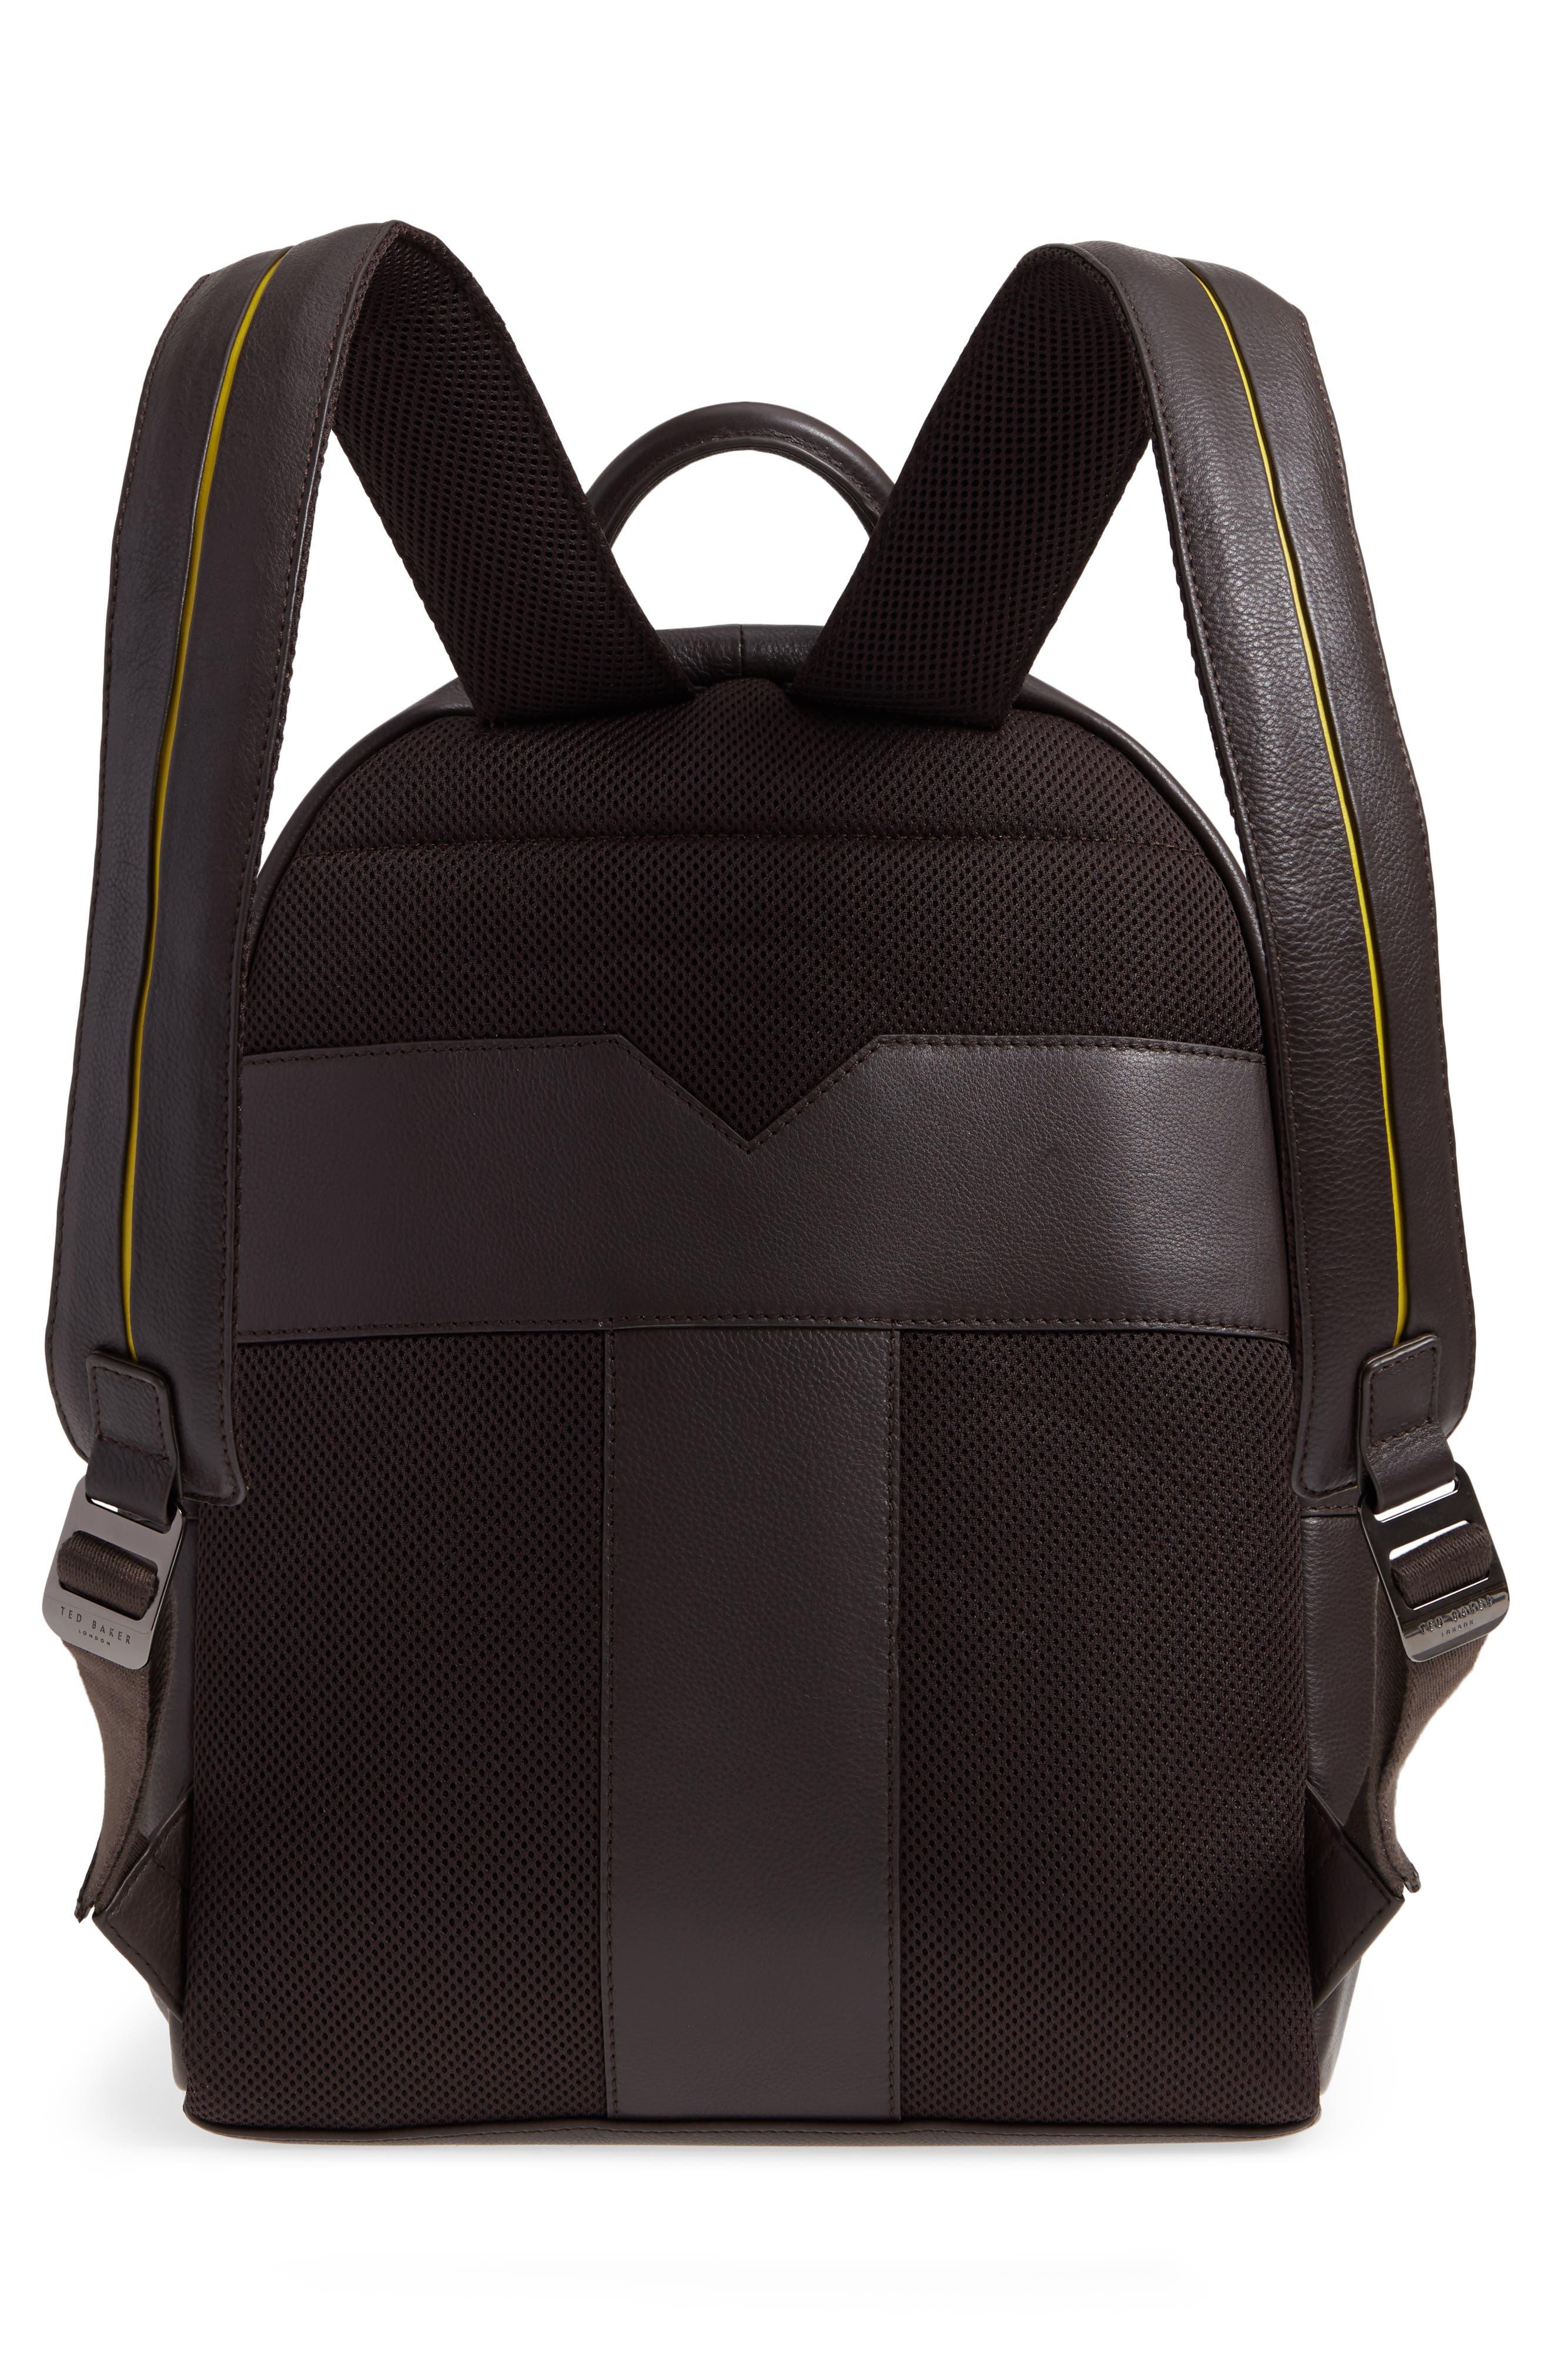 Huntman Stripe Backpack,                             Alternate thumbnail 3, color,                             Chocolate